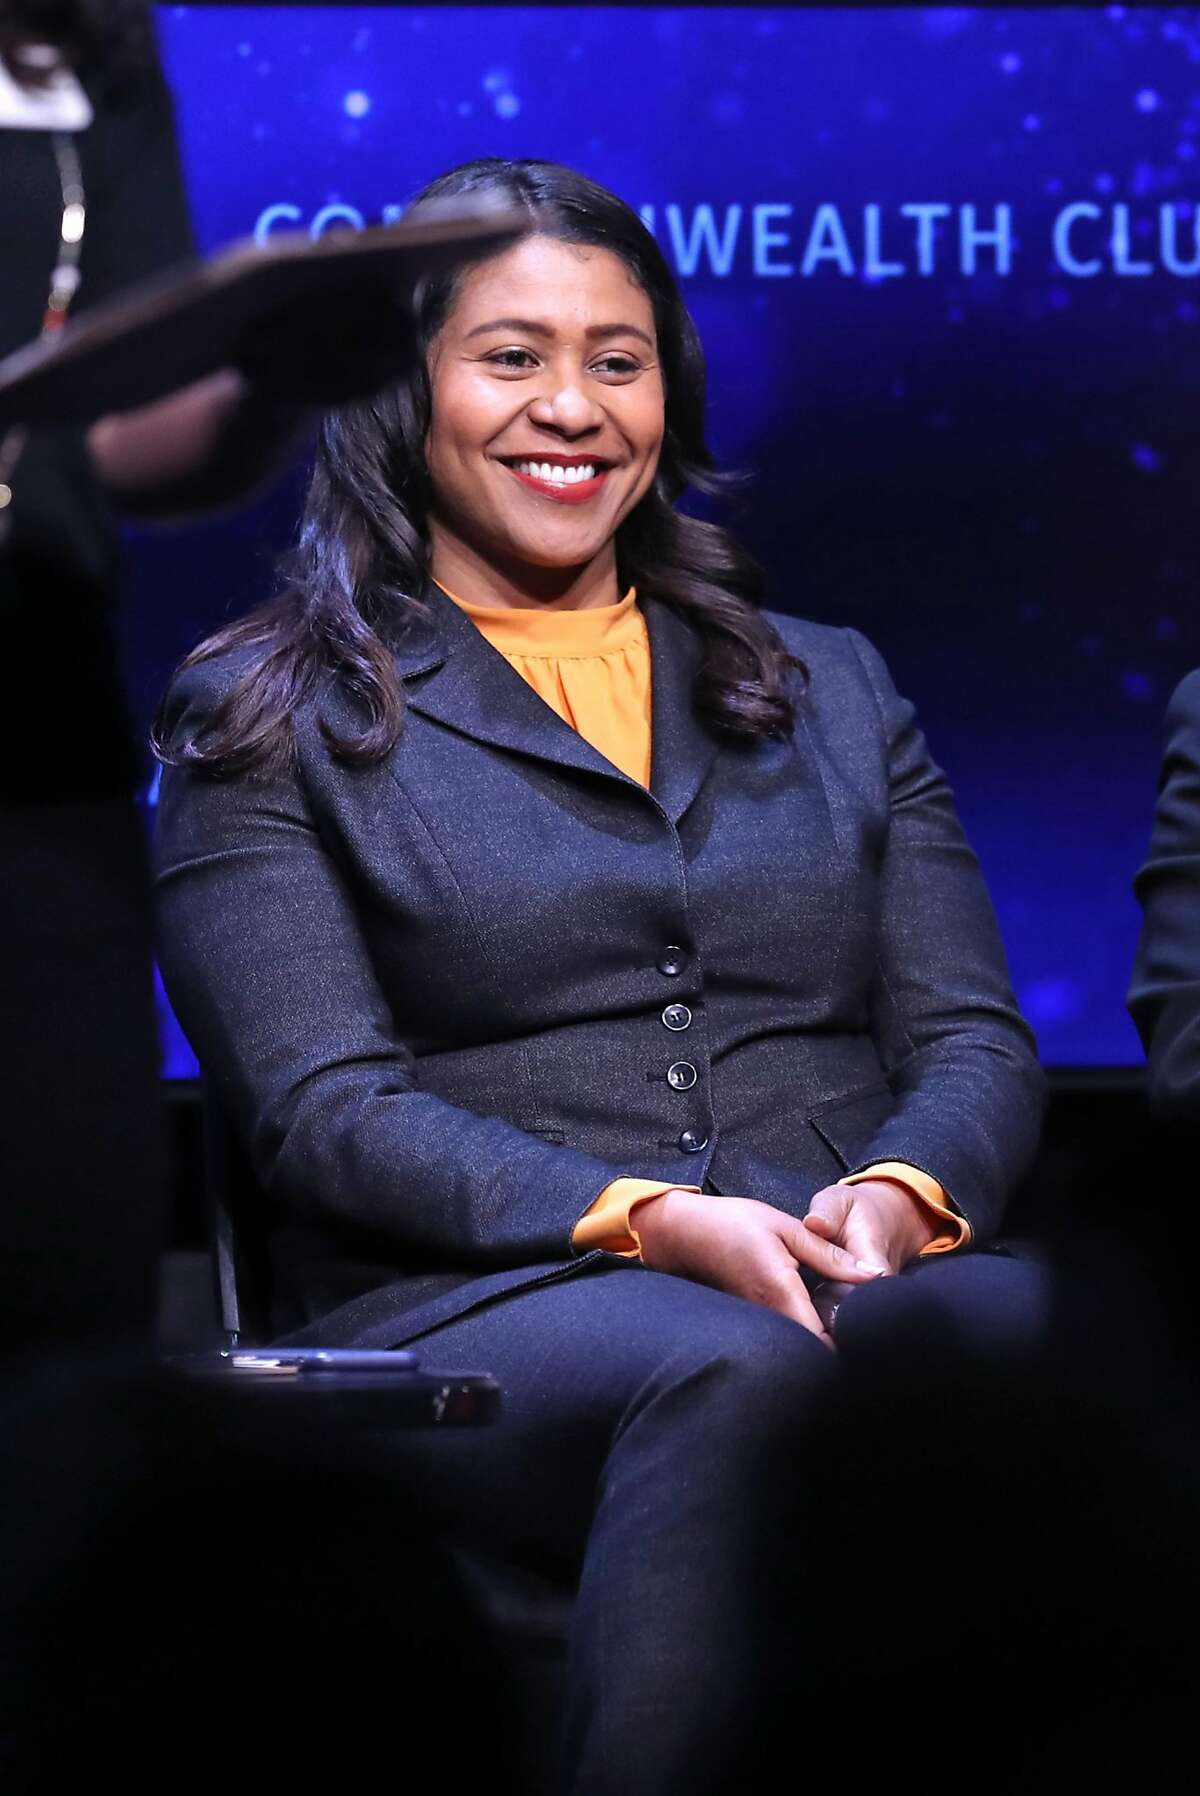 London Breed during San Francisco mayoral debate at Commonwealth Club in San Francisco, CA on Monday, May 14, 2018.